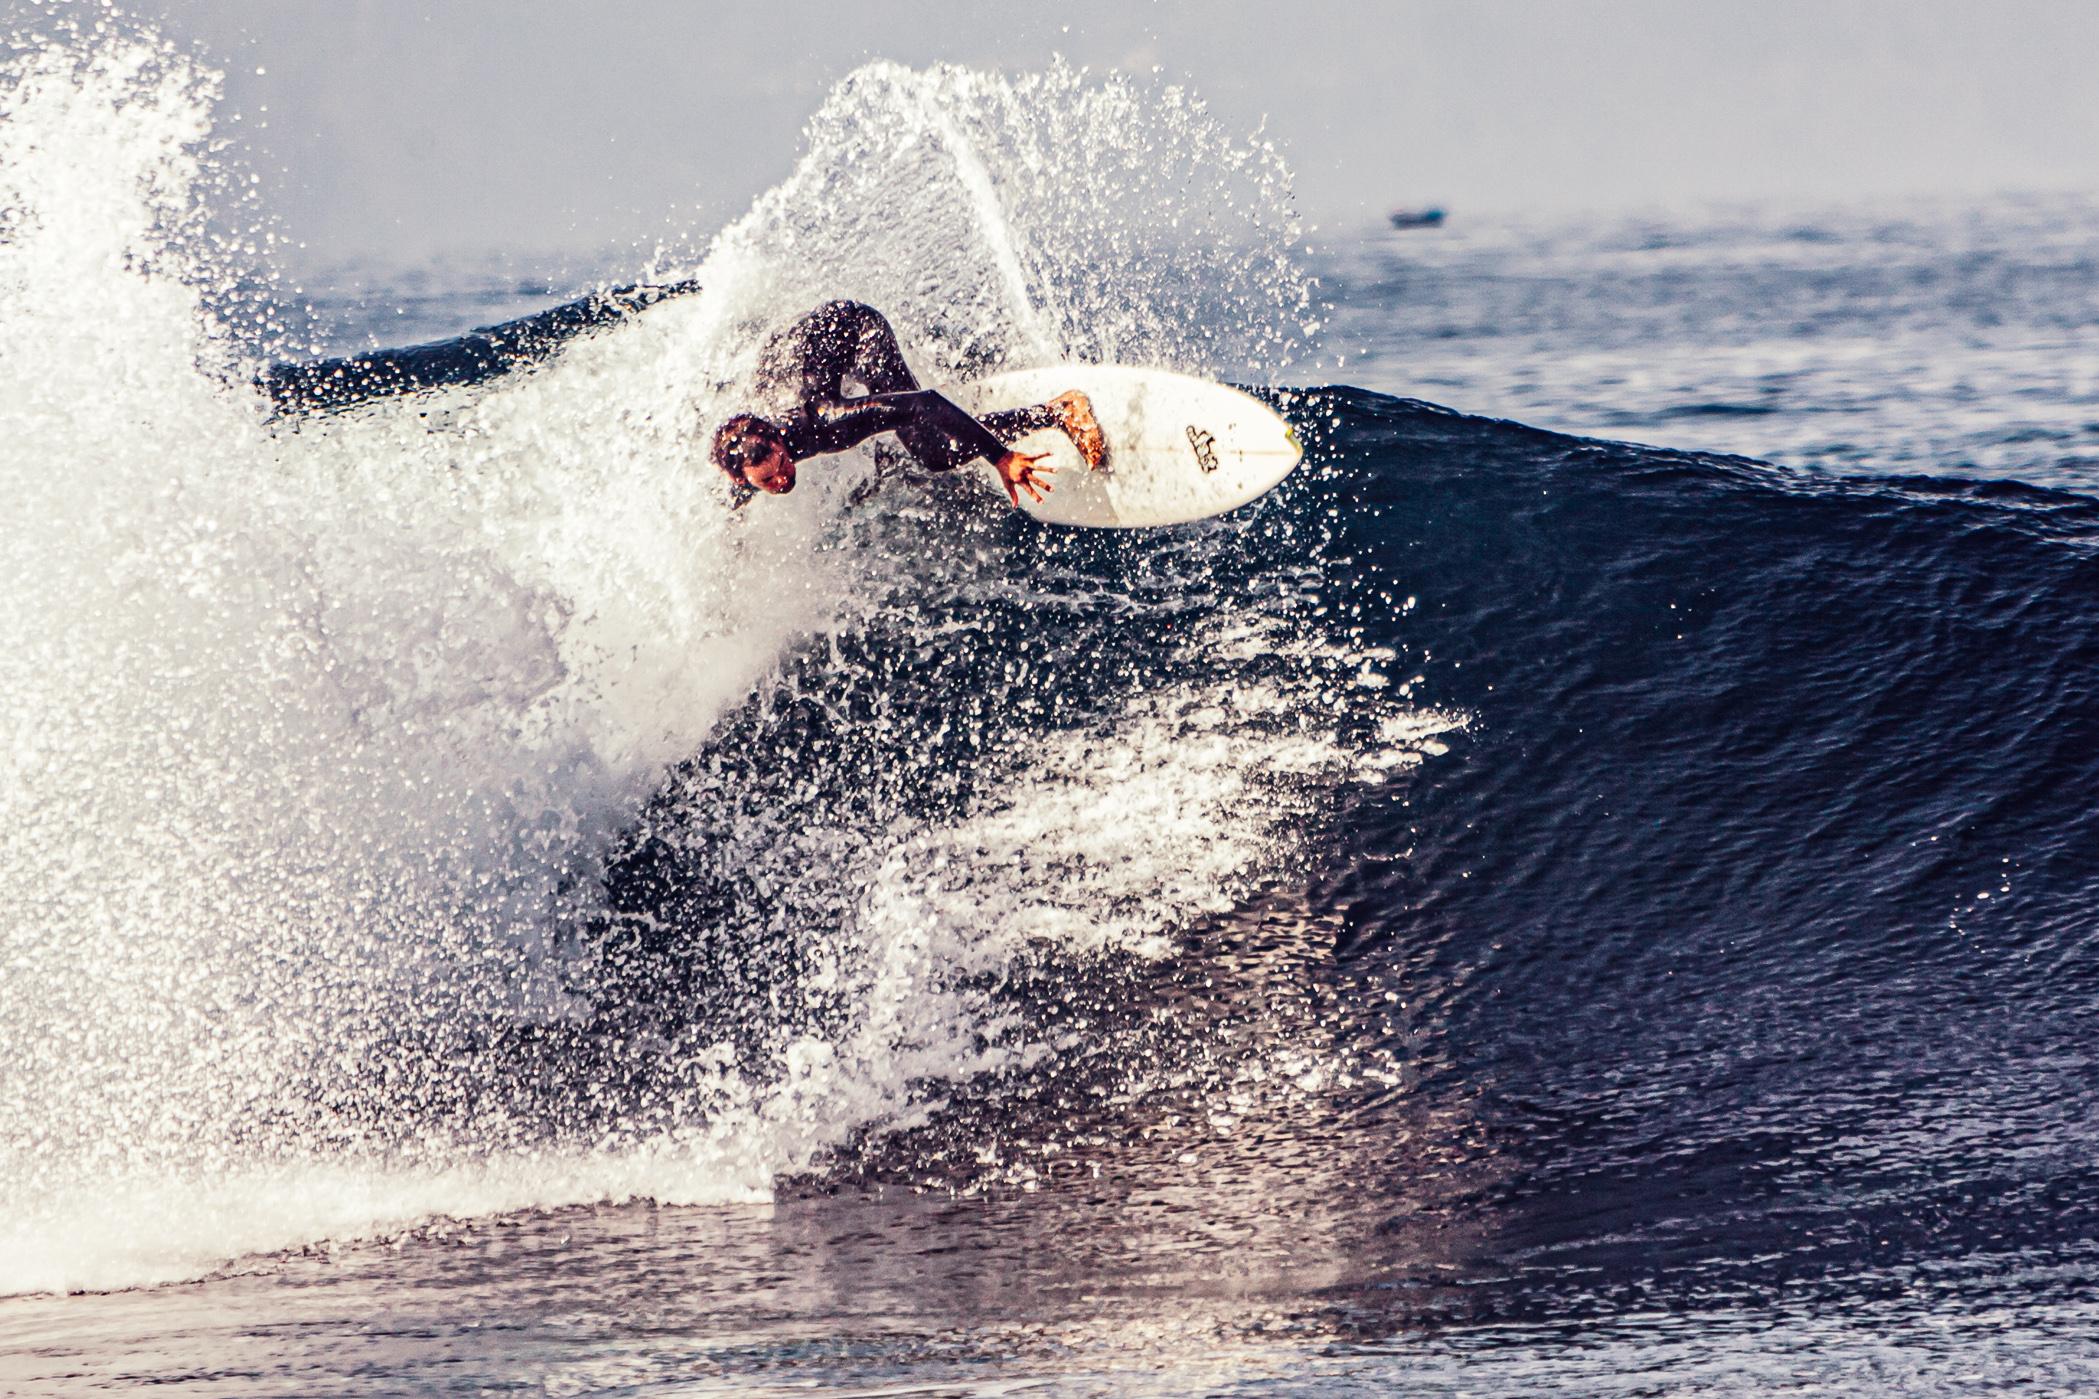 Surfing, Surfer, Tenerife, Teneriffa, Florian Kresse, Welle, Wellenreiten, Big Wave, Morning